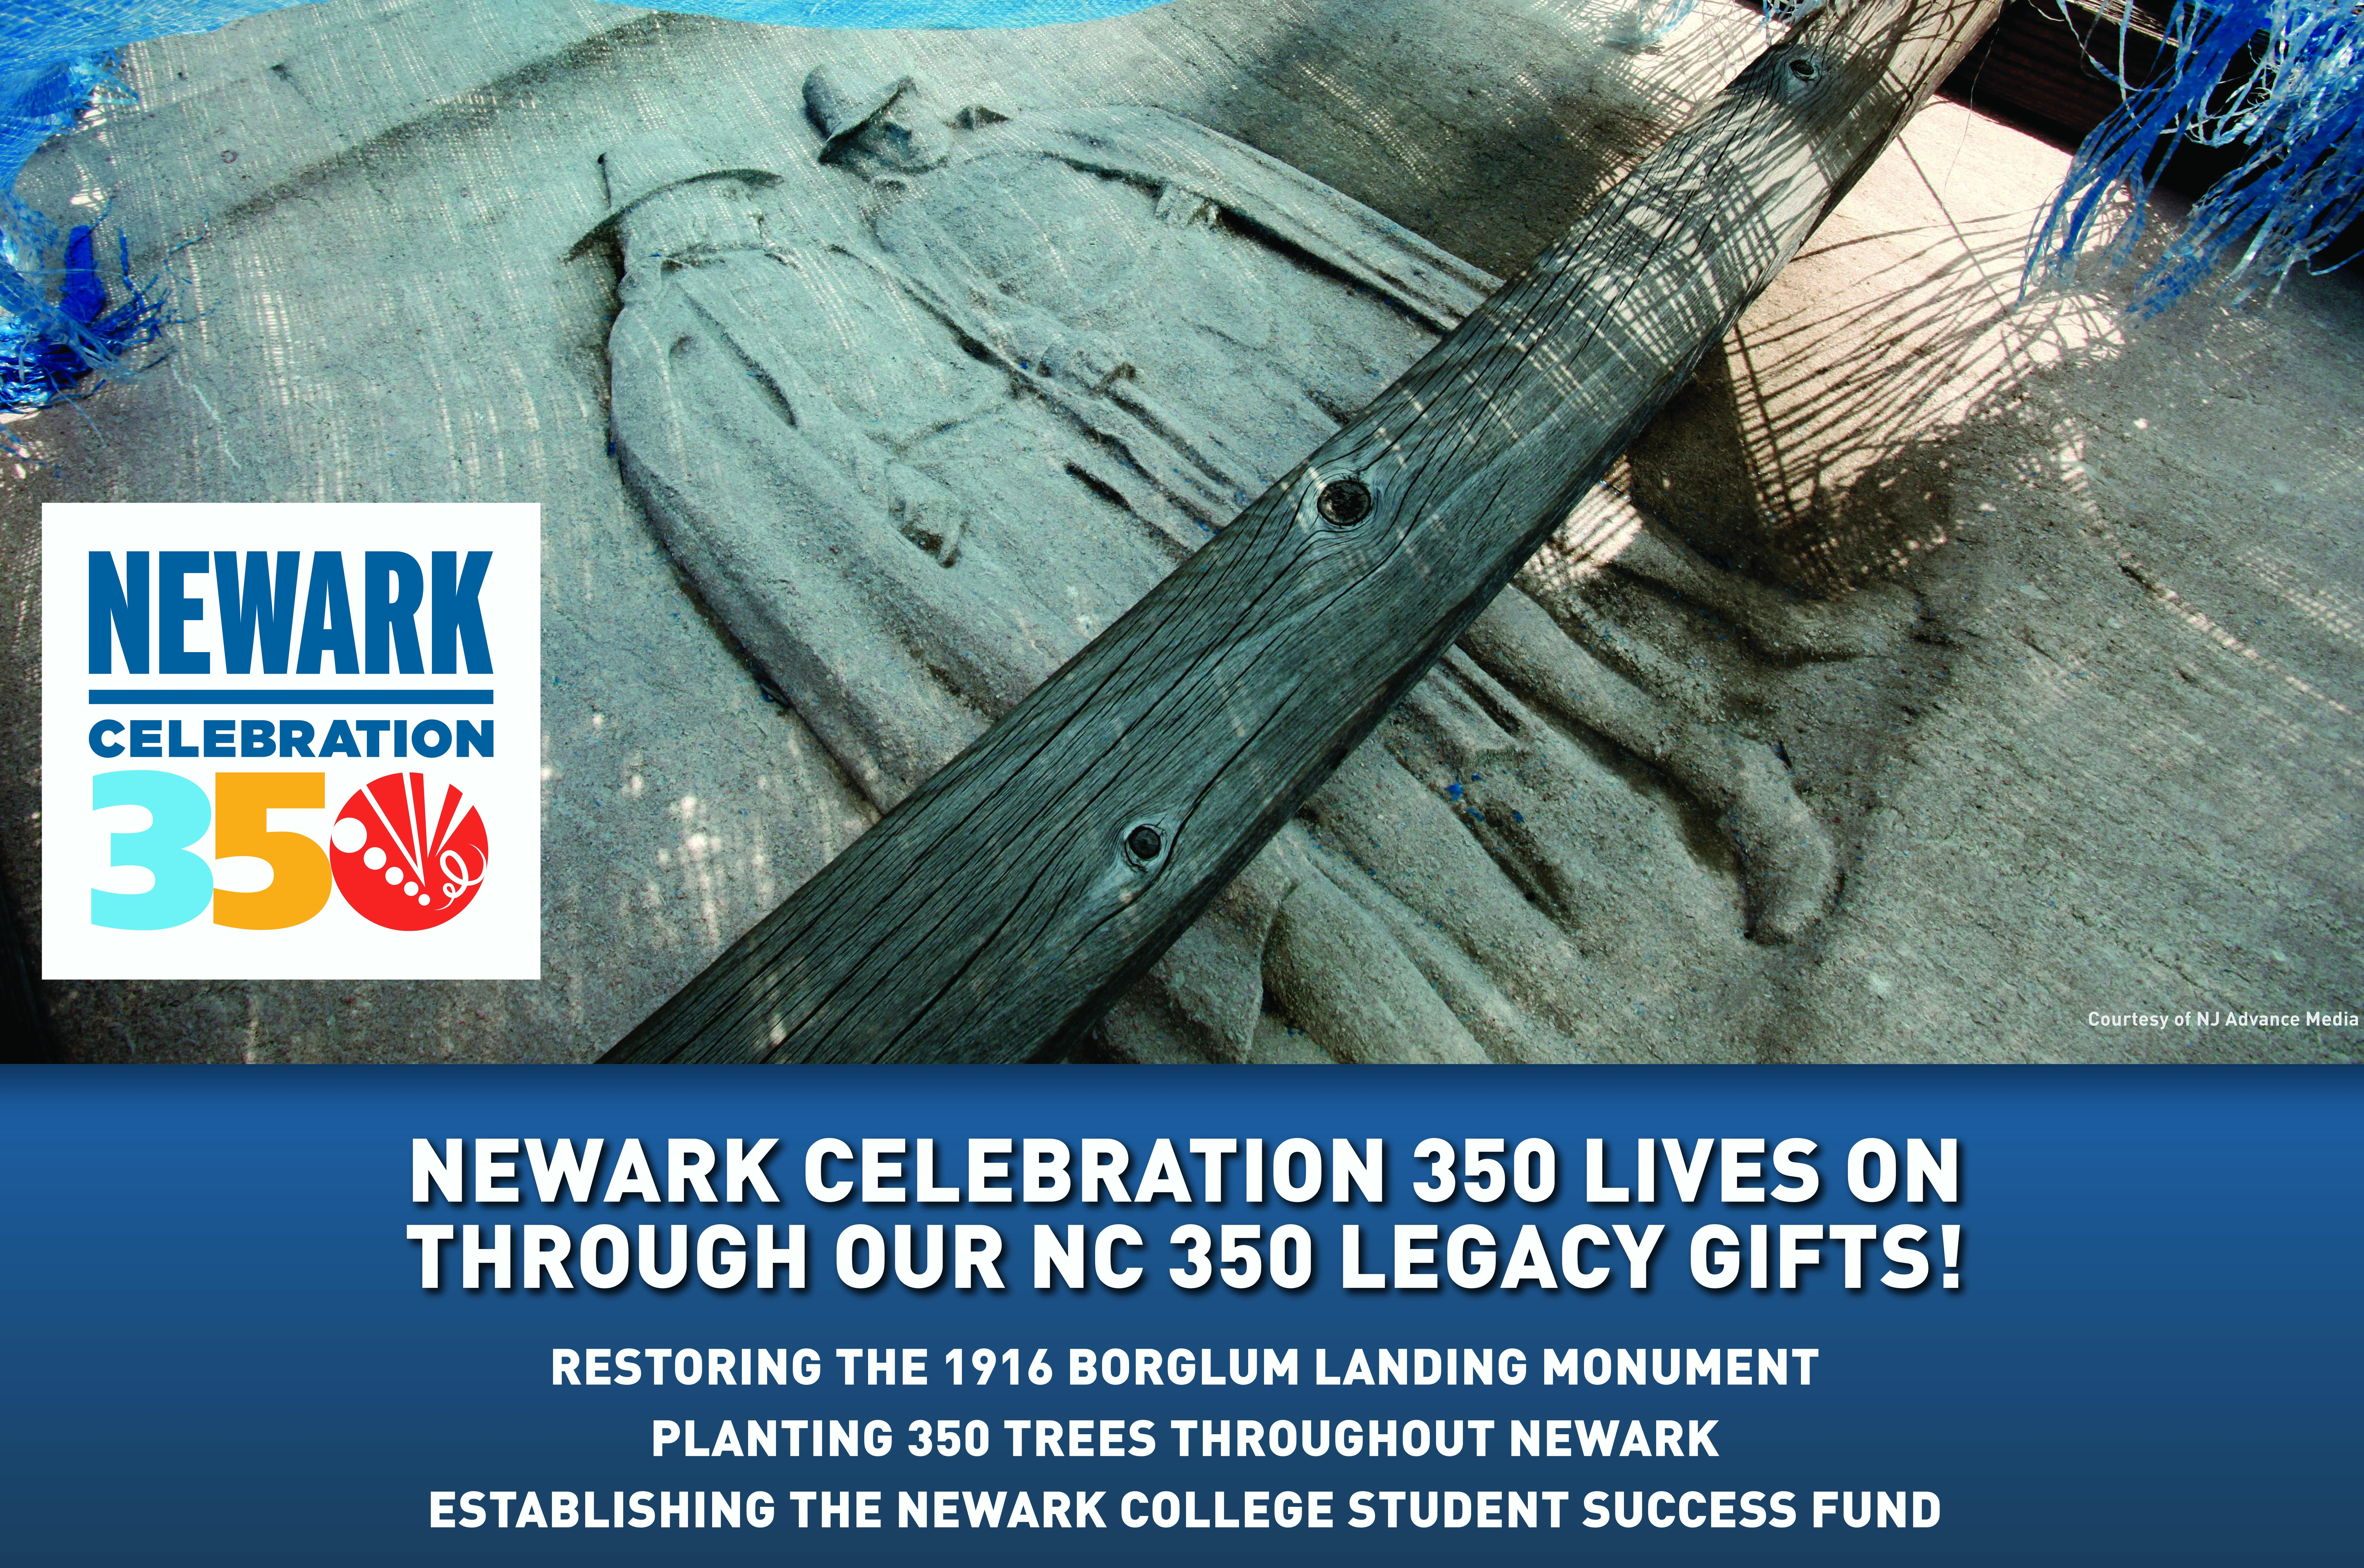 Newark Celebration 350 Restores Historic Gutzon Borglum Monument at NJPAC